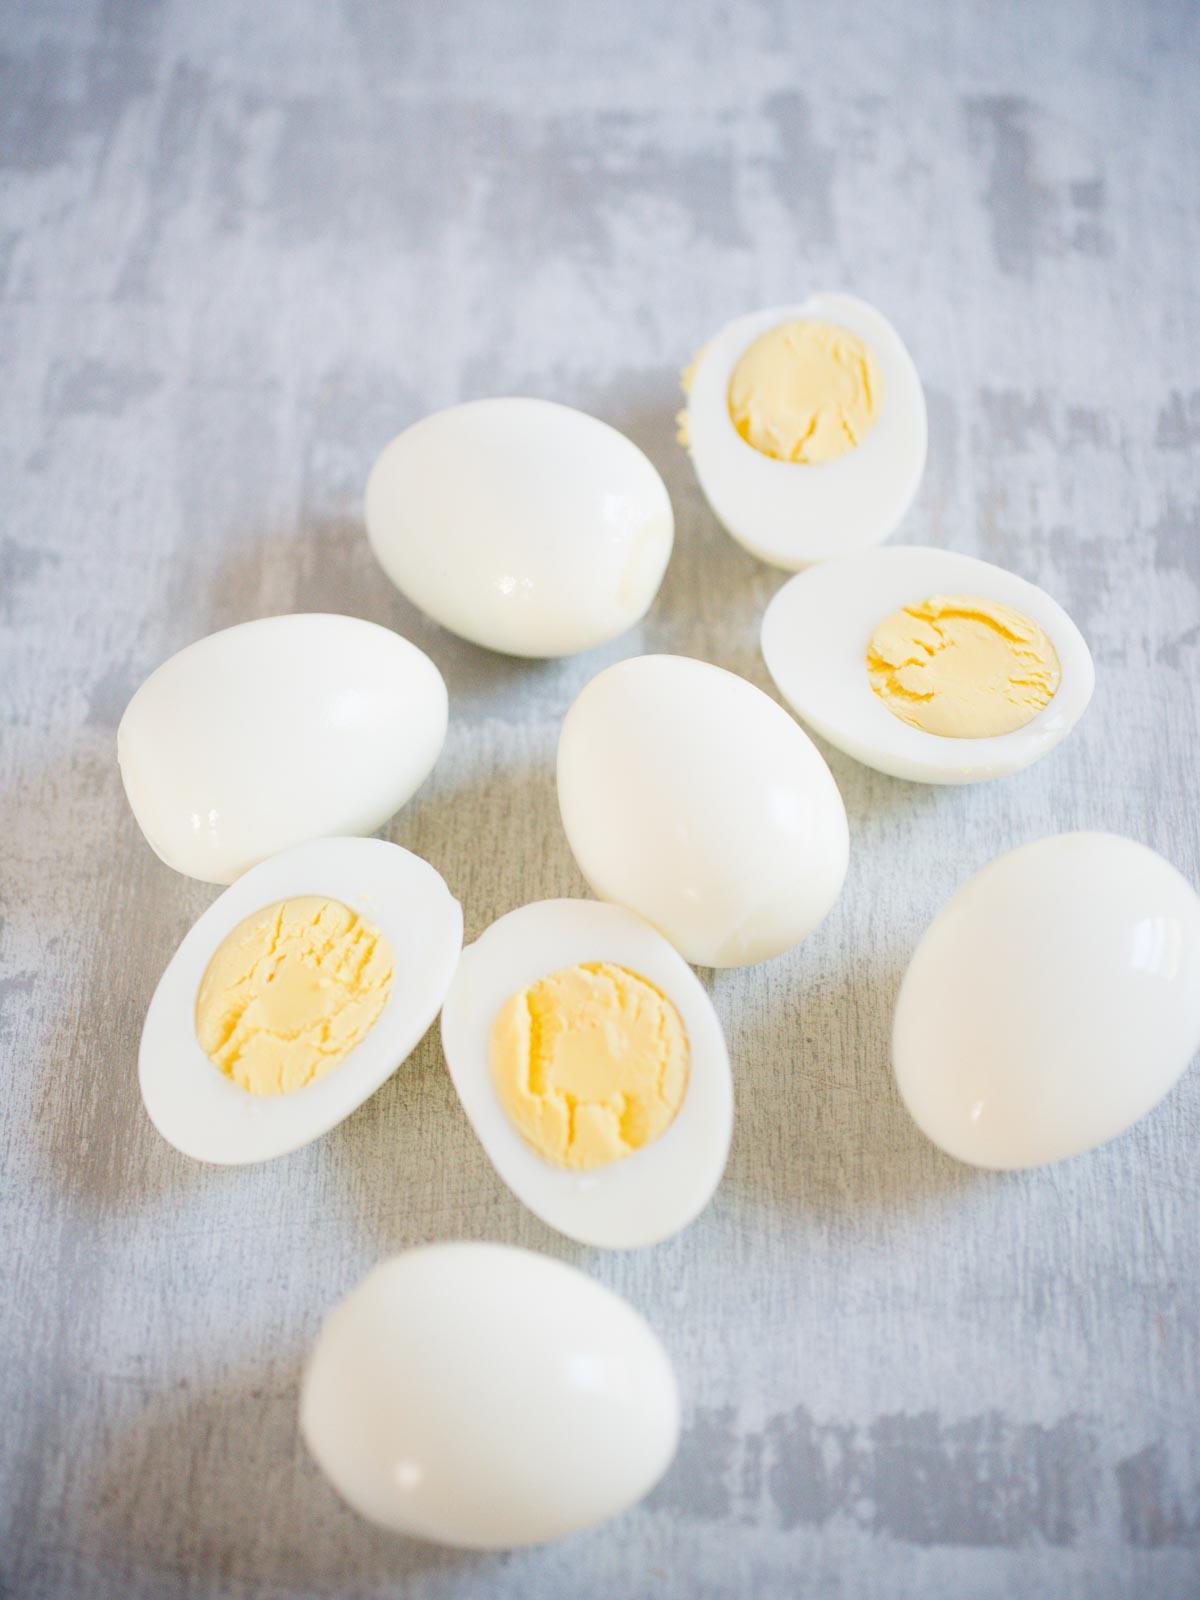 peeled hard boiled eggs with a few sliced